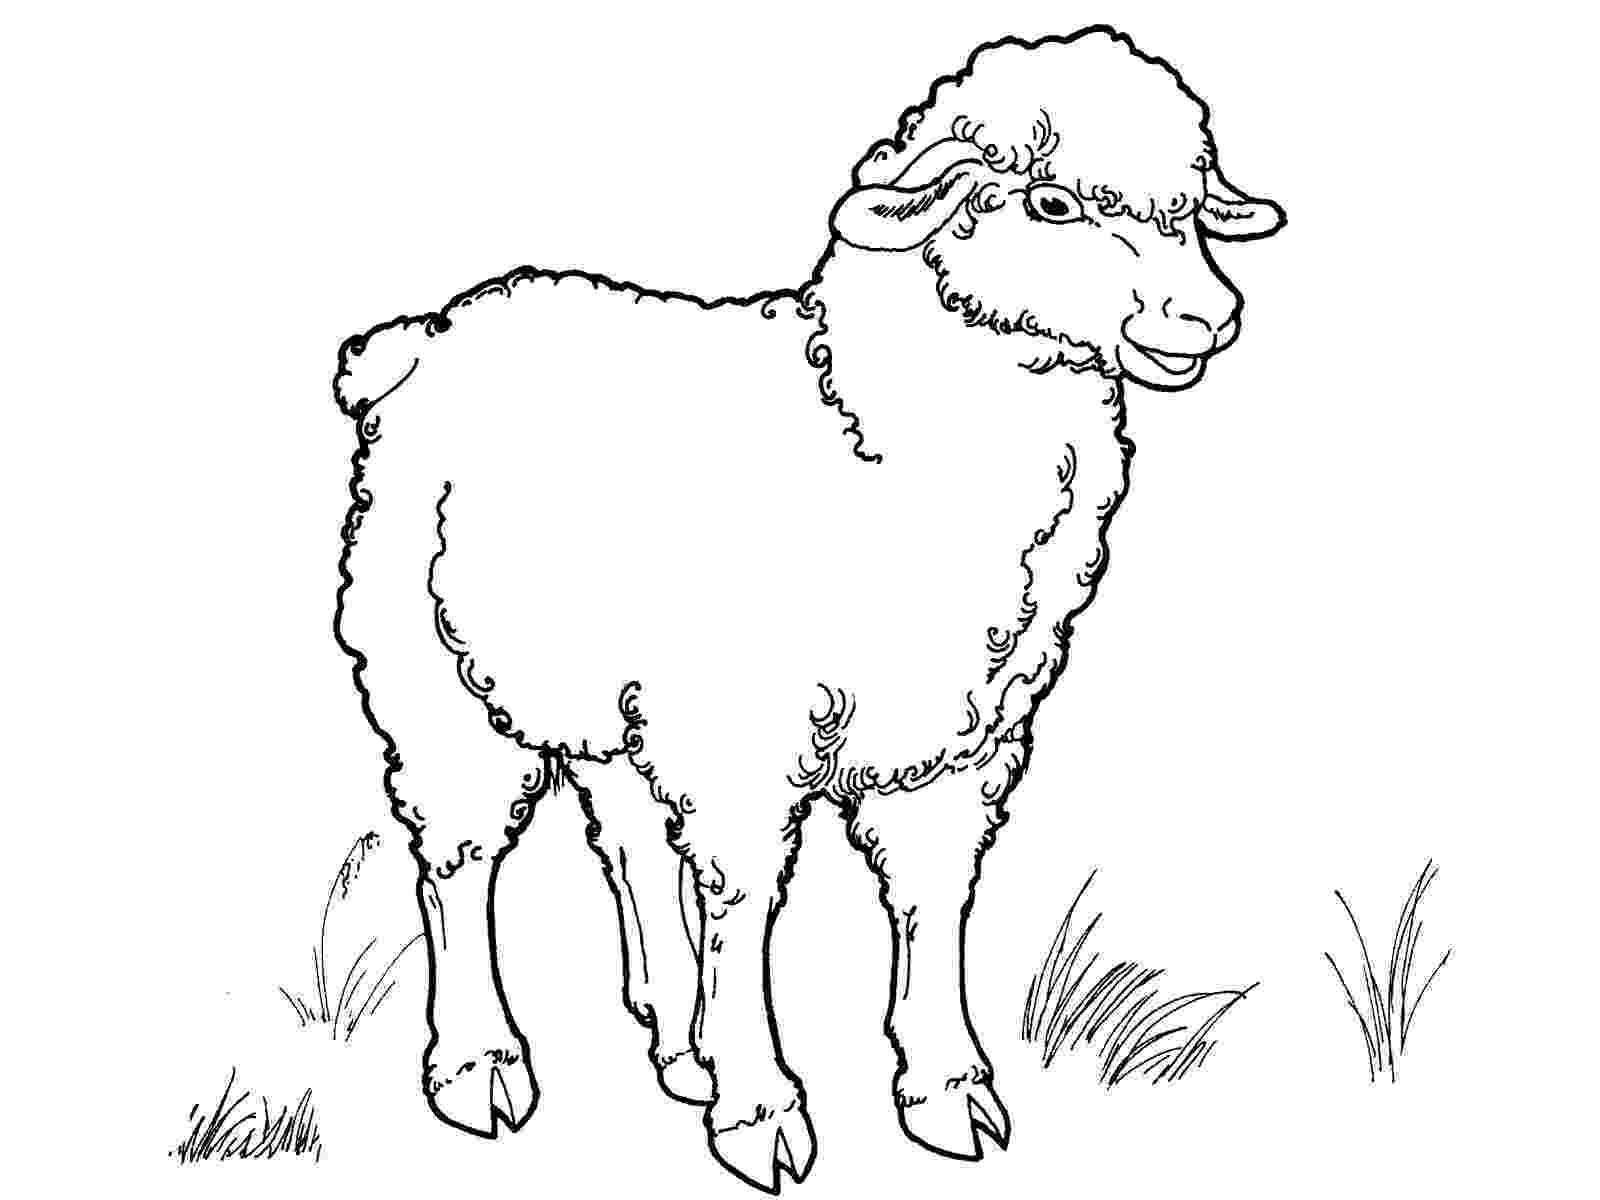 coloring book pages sheep free printable sheep coloring pages for kids book pages sheep coloring